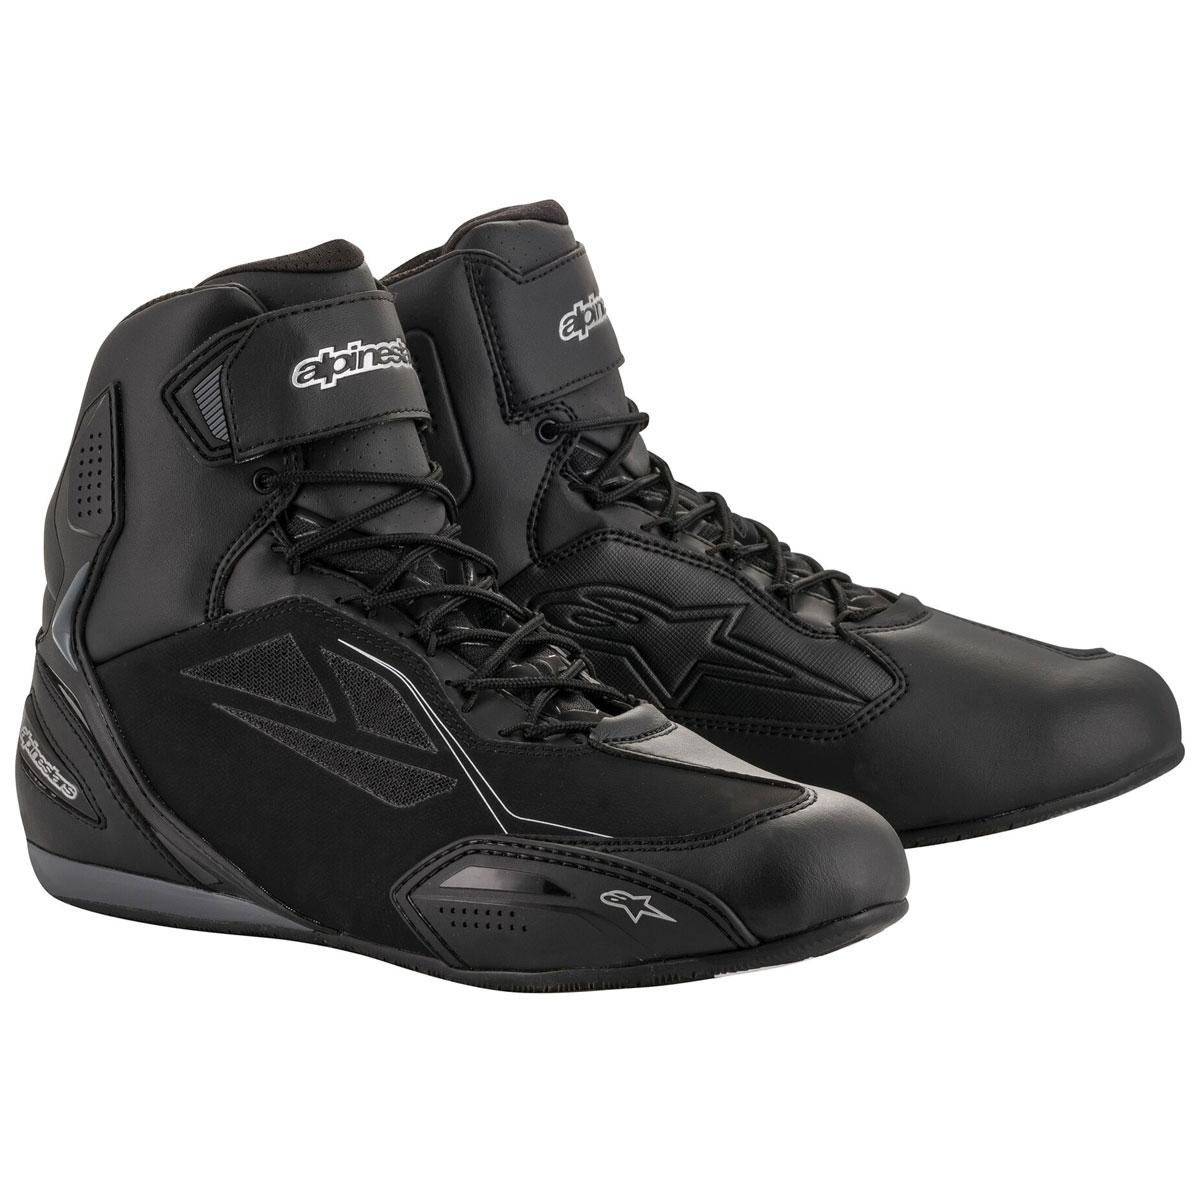 Alpinestars Women's Stella Faster-3 Drystar Black/Silver Boots